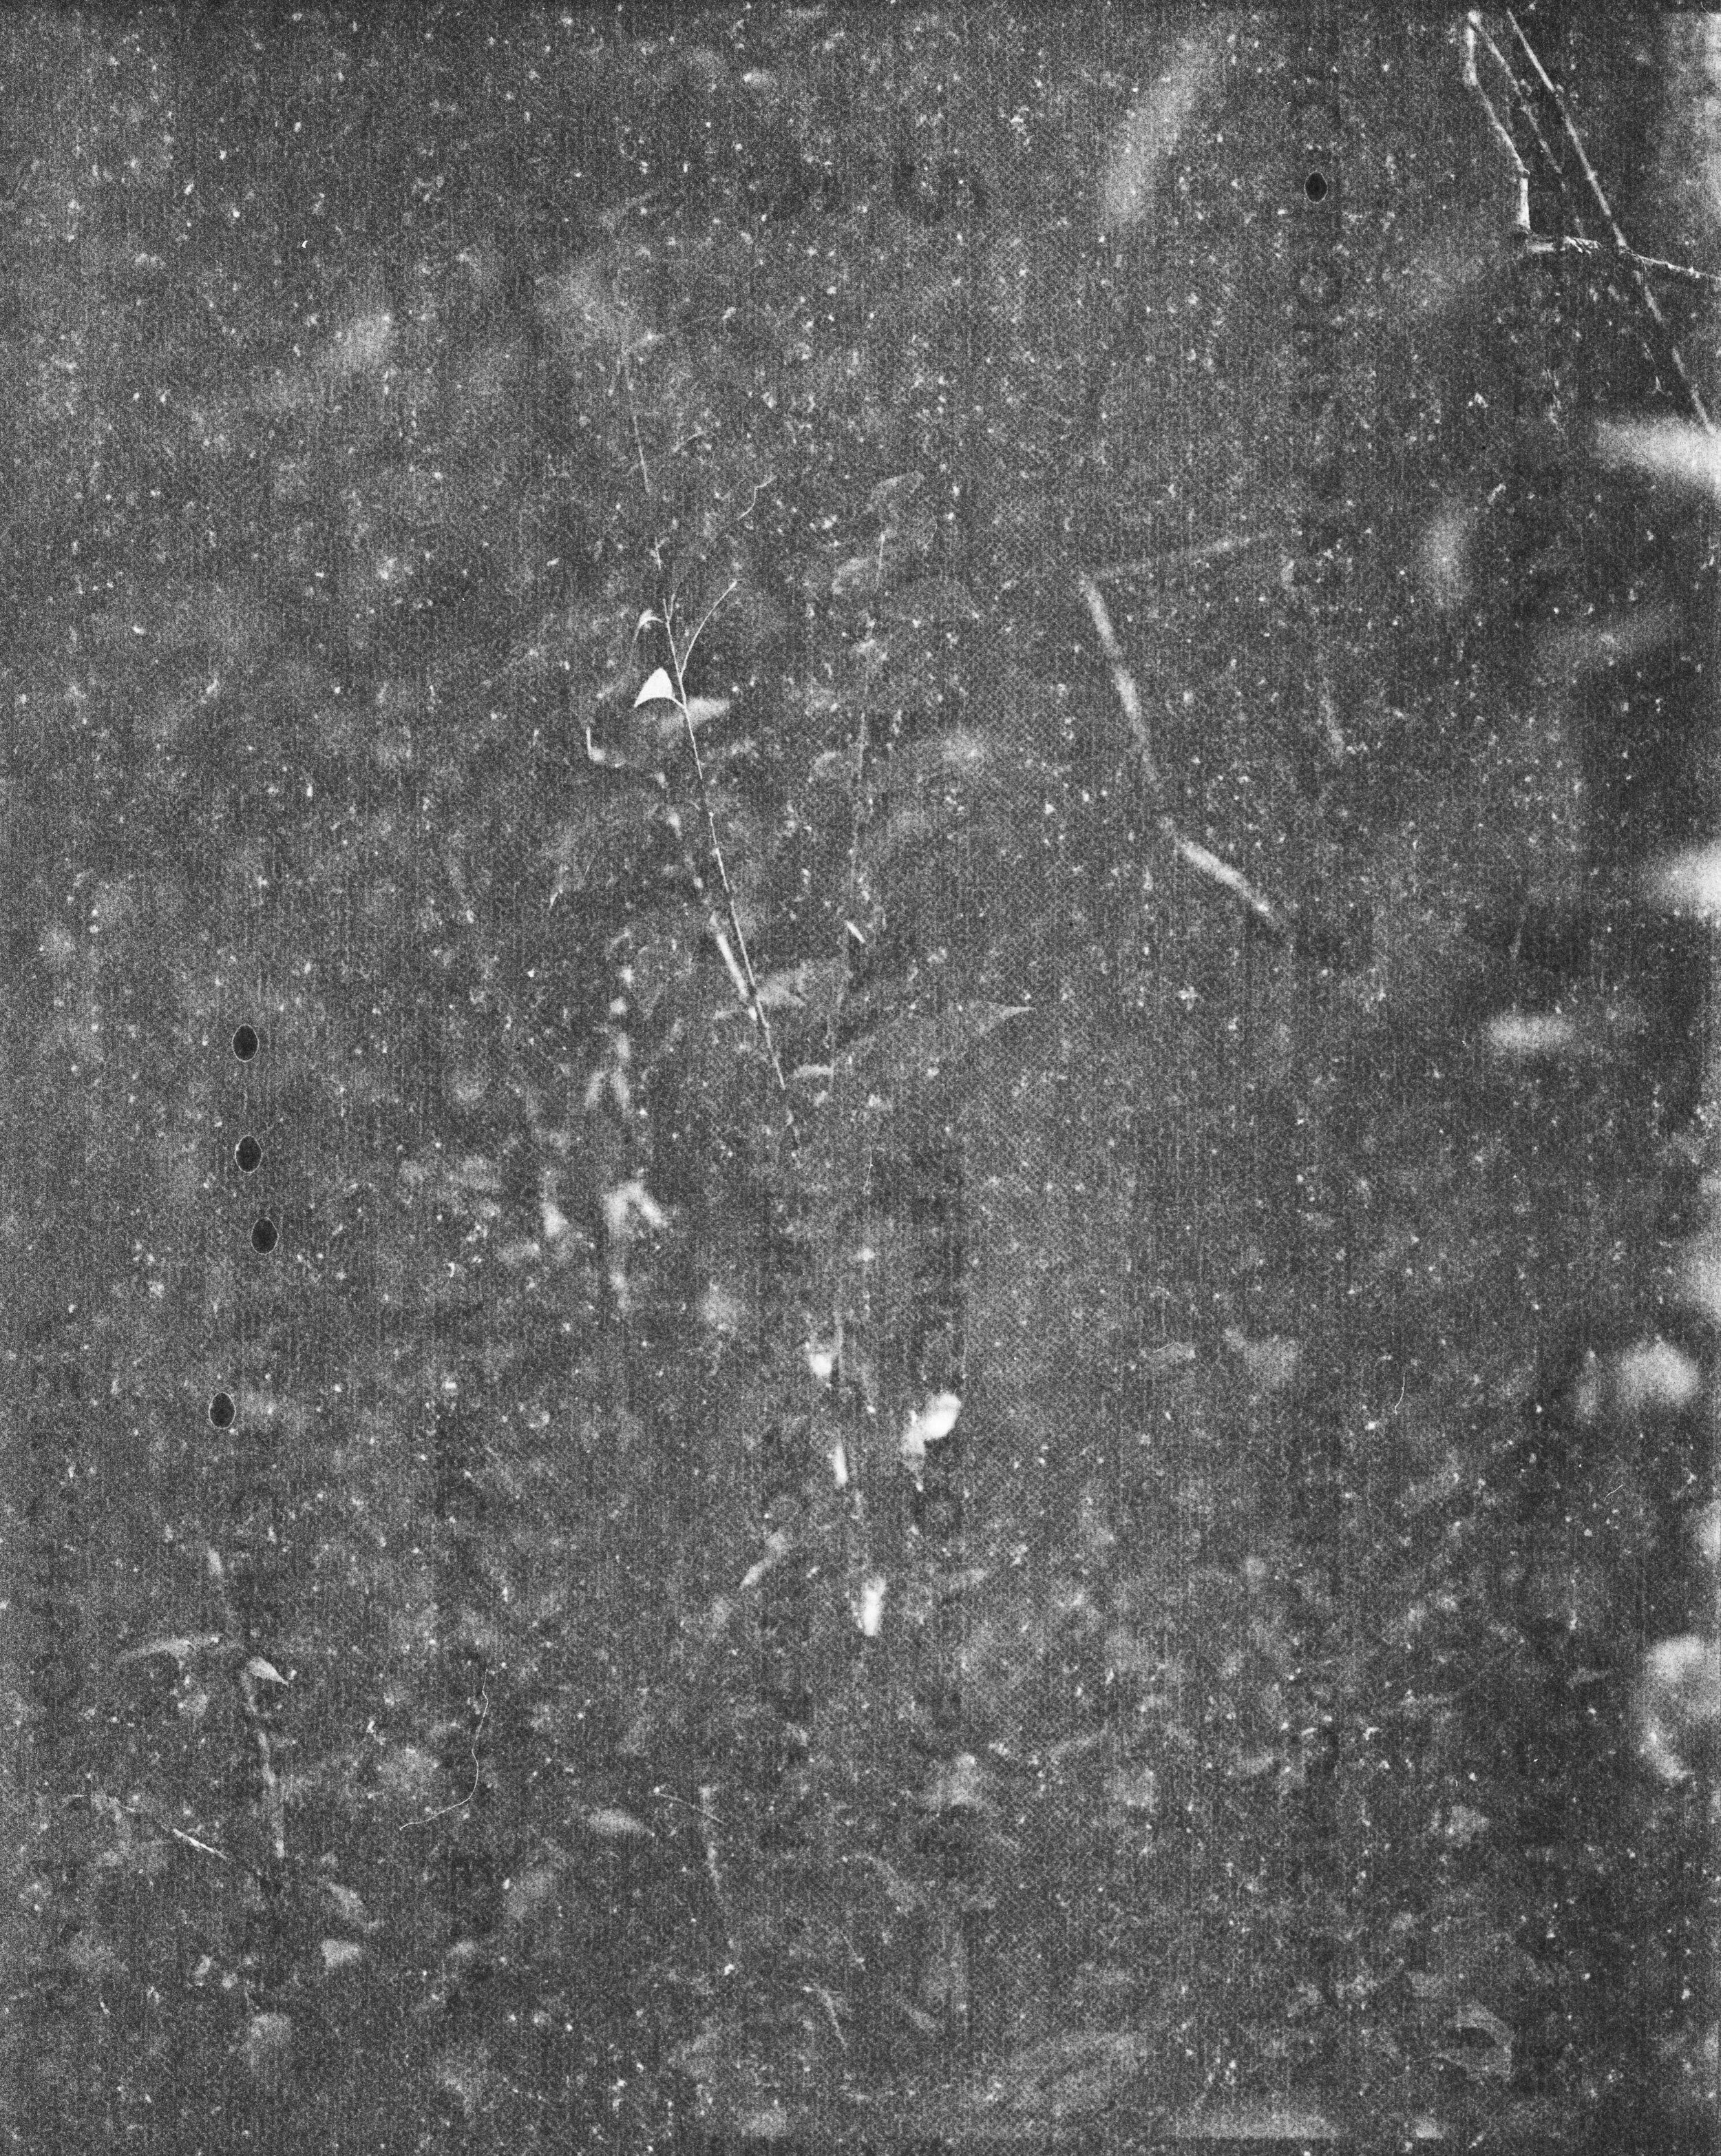 lydiasee-creekoffspringdale2014-color120mm-batch143.JPG